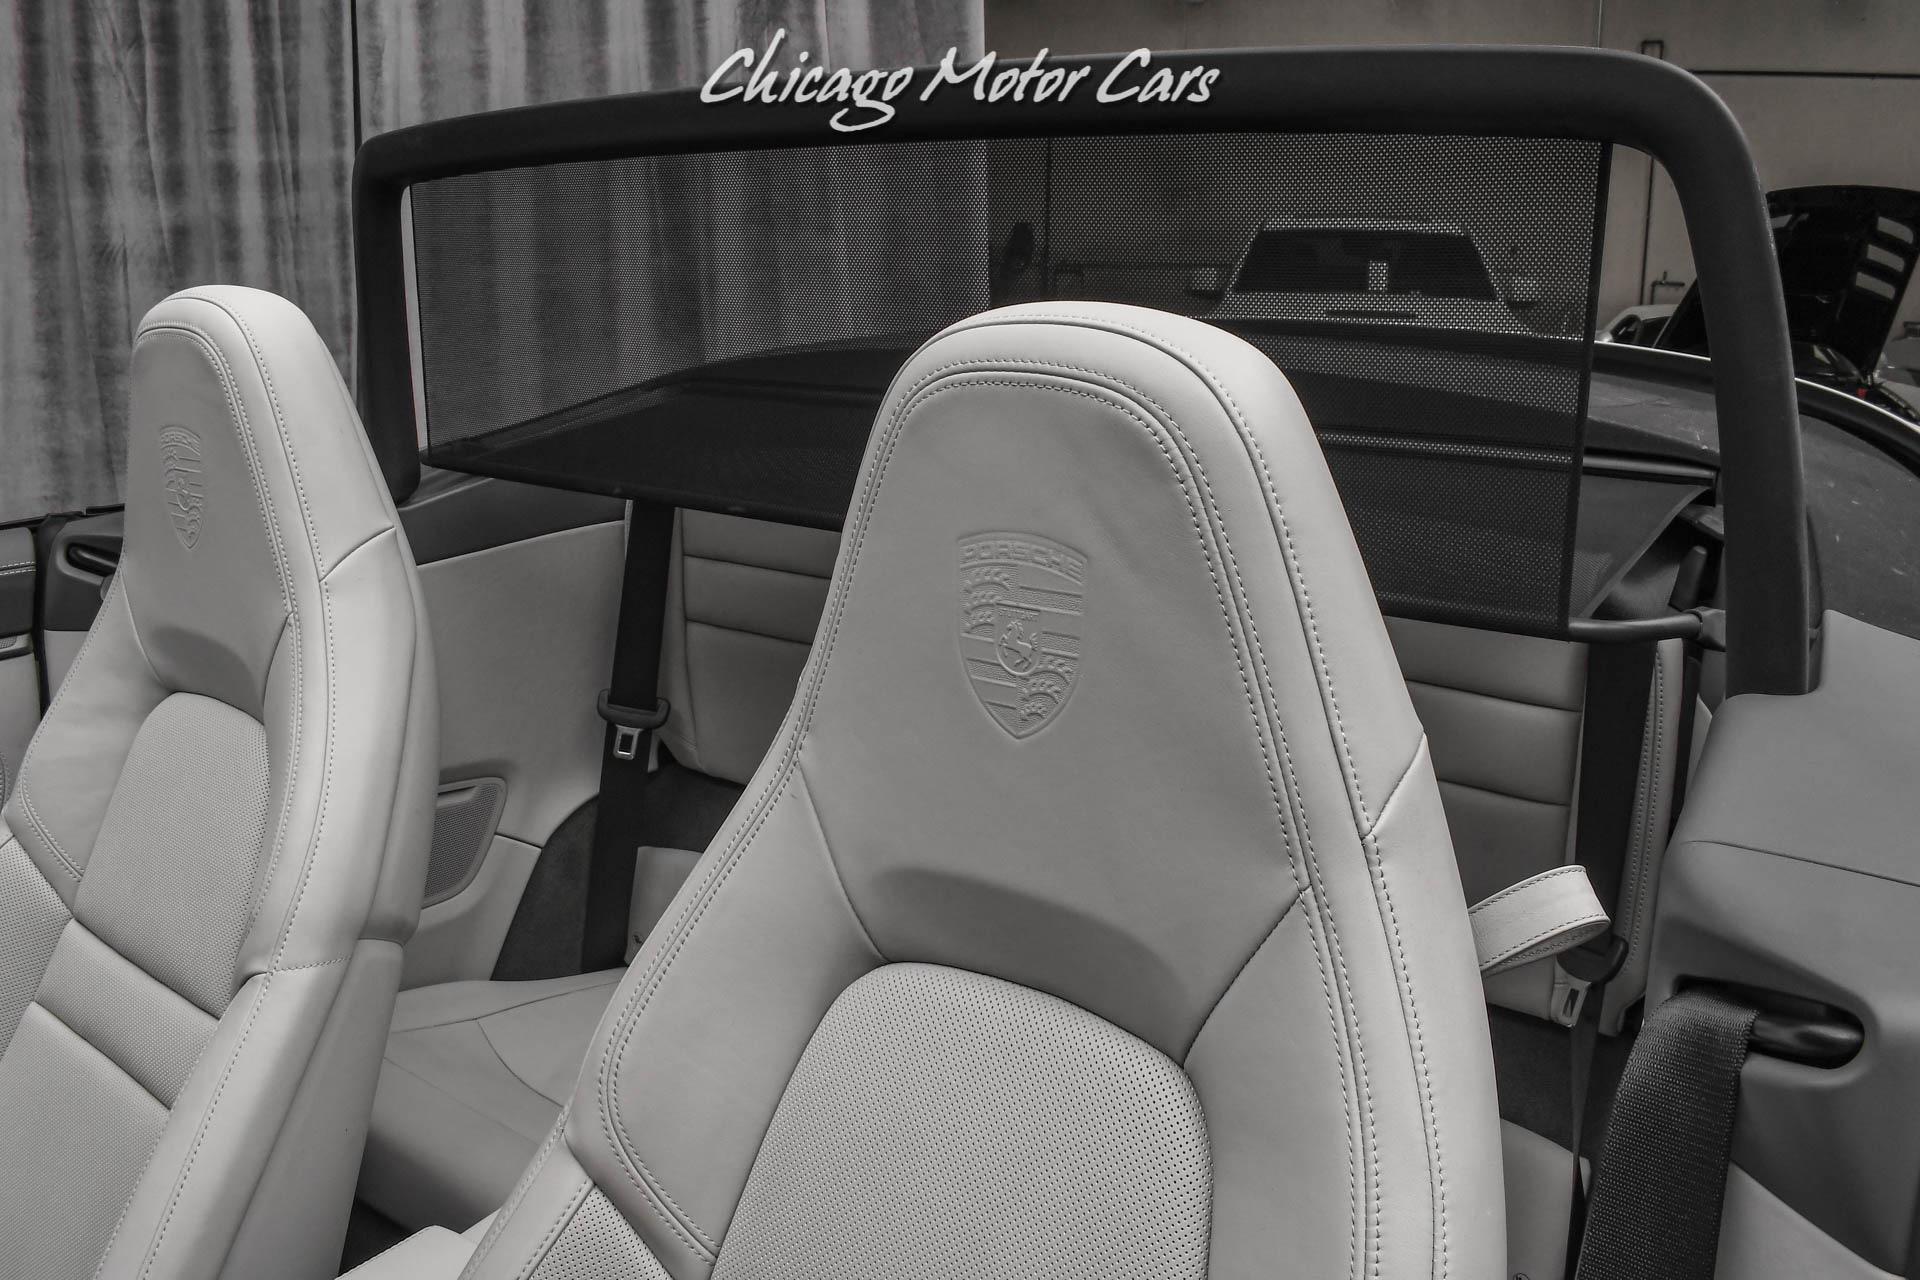 Used-2020-Porsche-911-Carrera-S-Cabriolet-RARE-CHALK-COLOR-Sport-Package